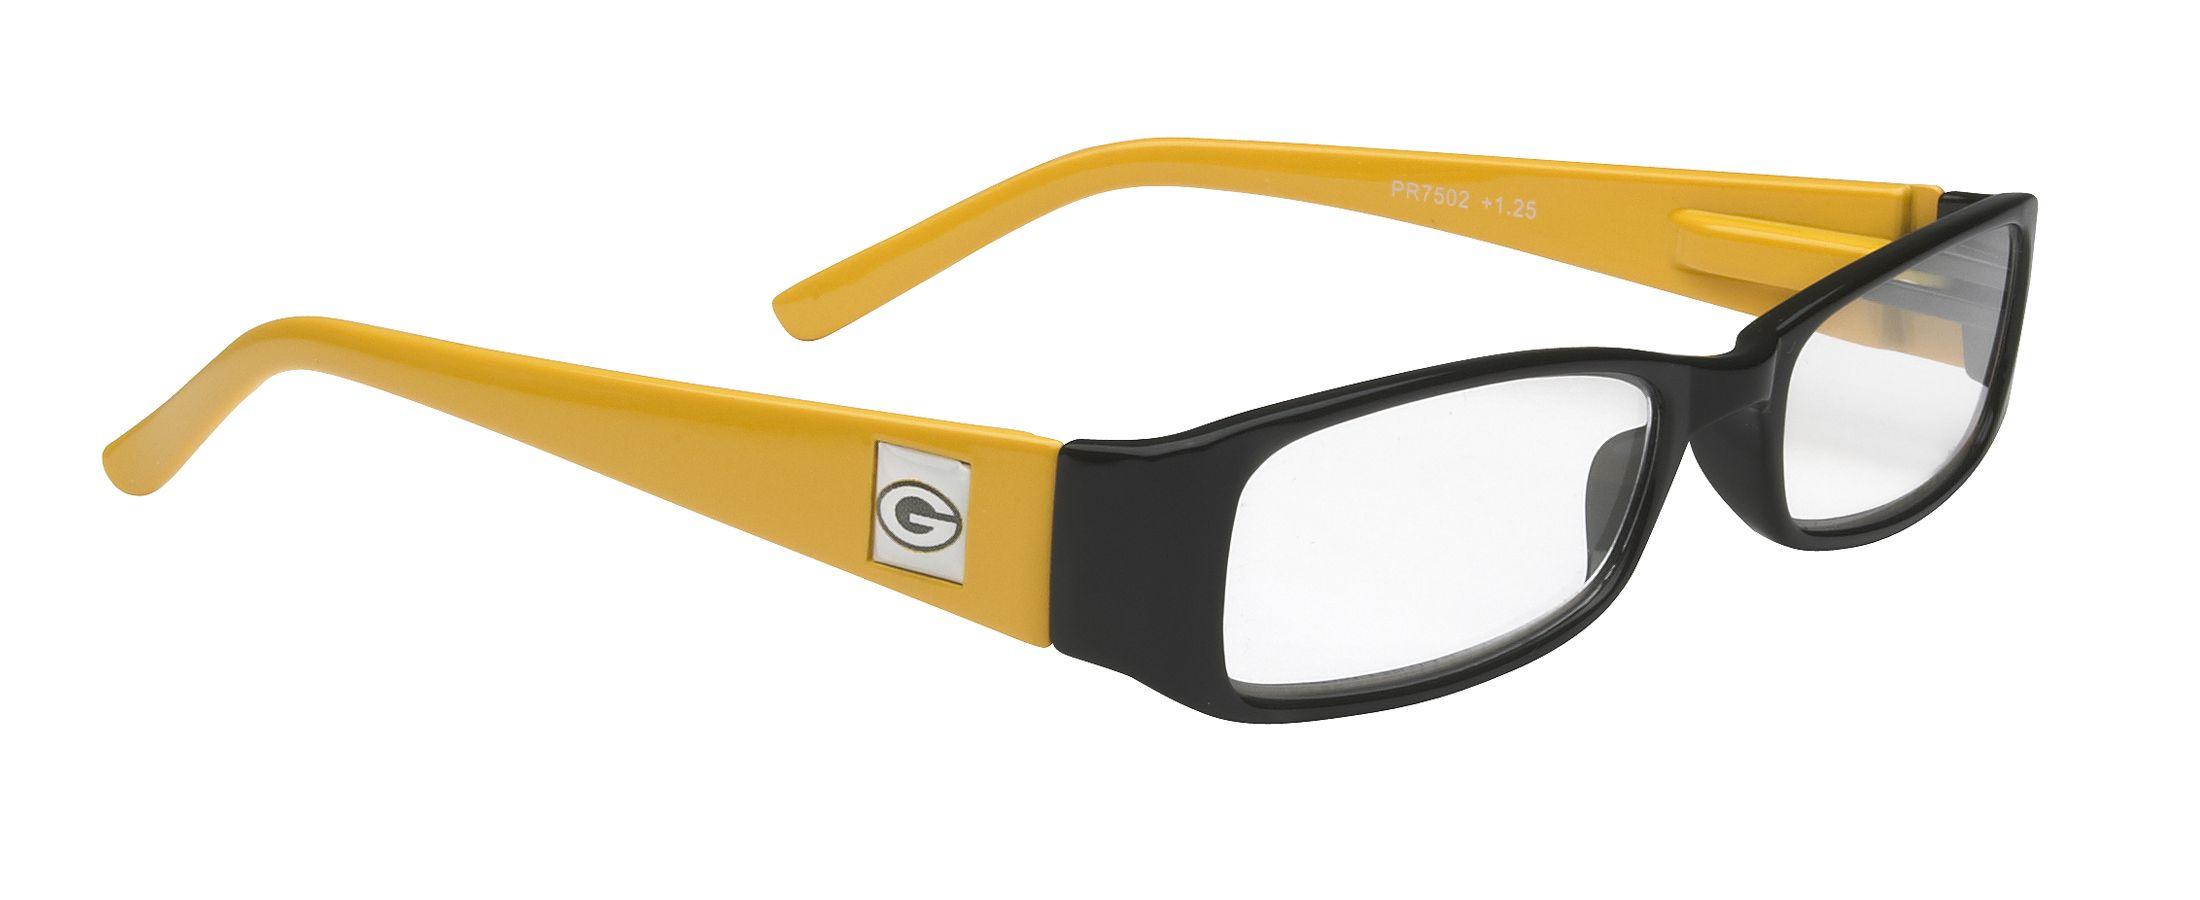 Nfl Green Bay Packers Reading Glasses Yellow And Black Frame With Logo Frgc115 Myeyewear2go Com Nfl Green Bay Glasses Reading Glasses